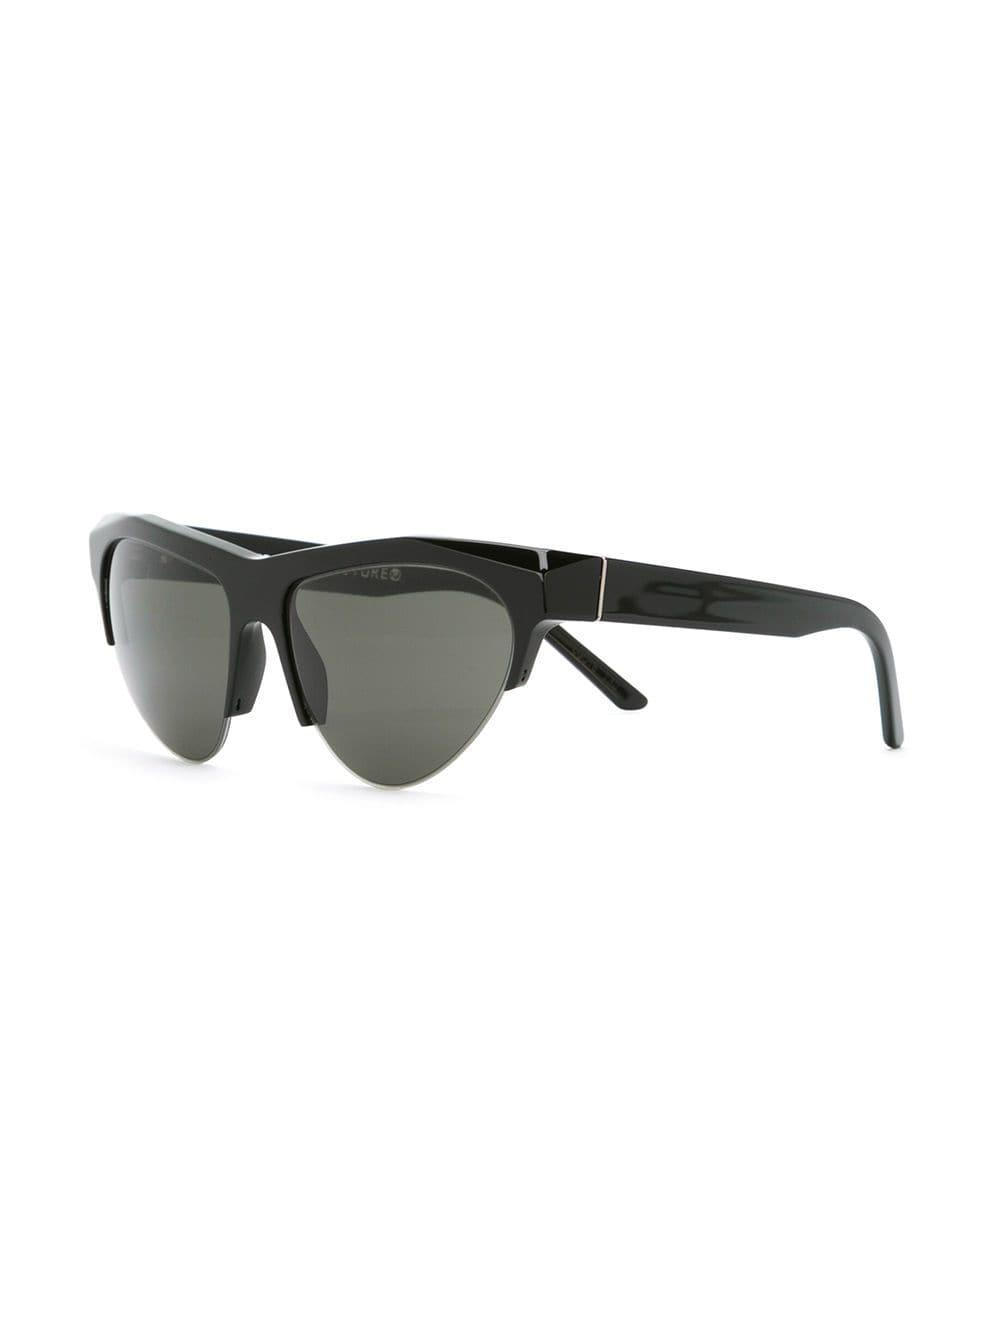 Retrosuperfuture 'ora' Sunglasses in Black